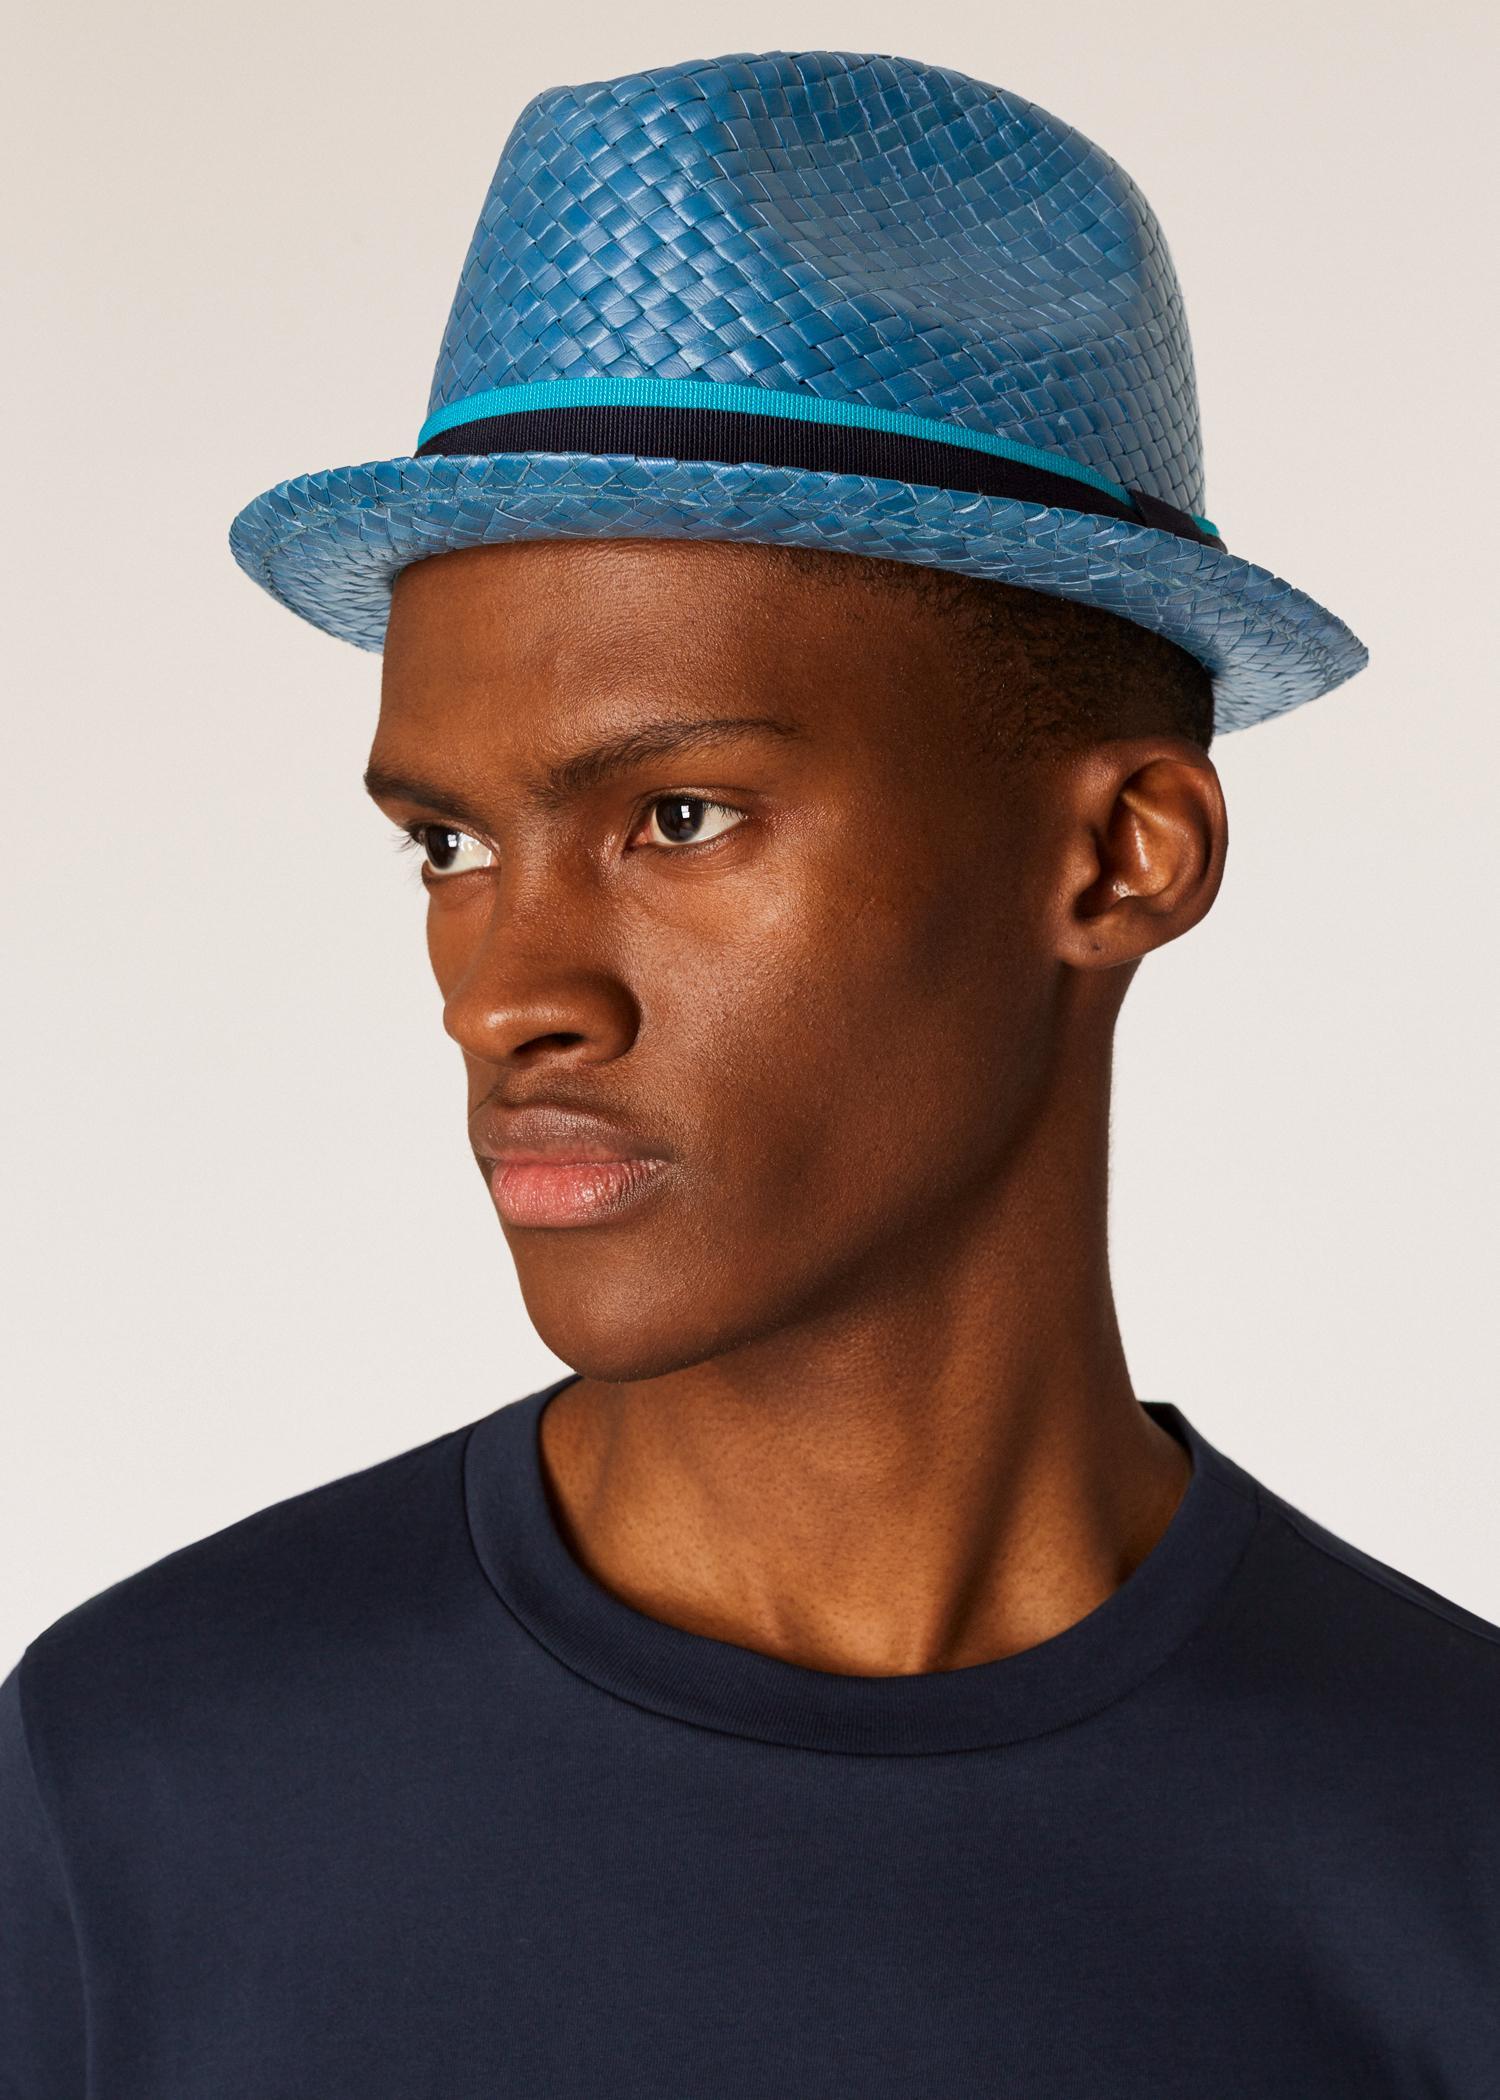 0e895e9462bf1d Lyst - Paul Smith Slate Blue Woven Trilby Hat in Blue for Men